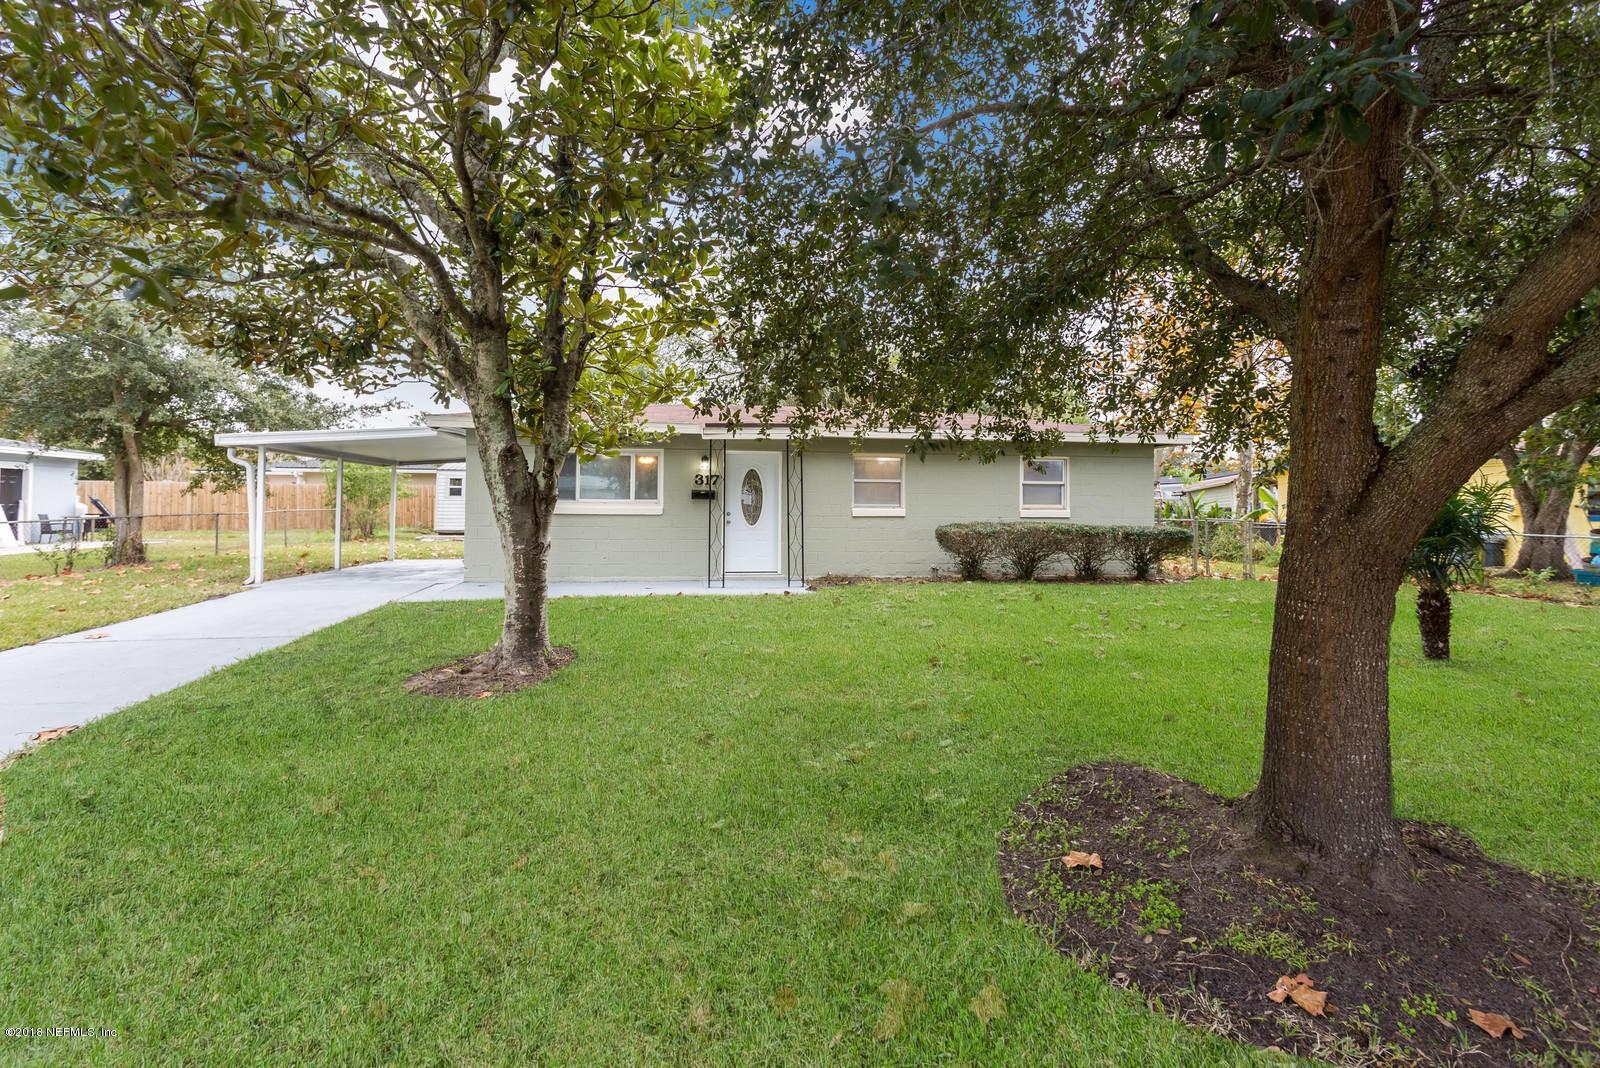 317 SARGO, ATLANTIC BEACH, FLORIDA 32233, 3 Bedrooms Bedrooms, ,1 BathroomBathrooms,Residential - single family,For sale,SARGO,970673